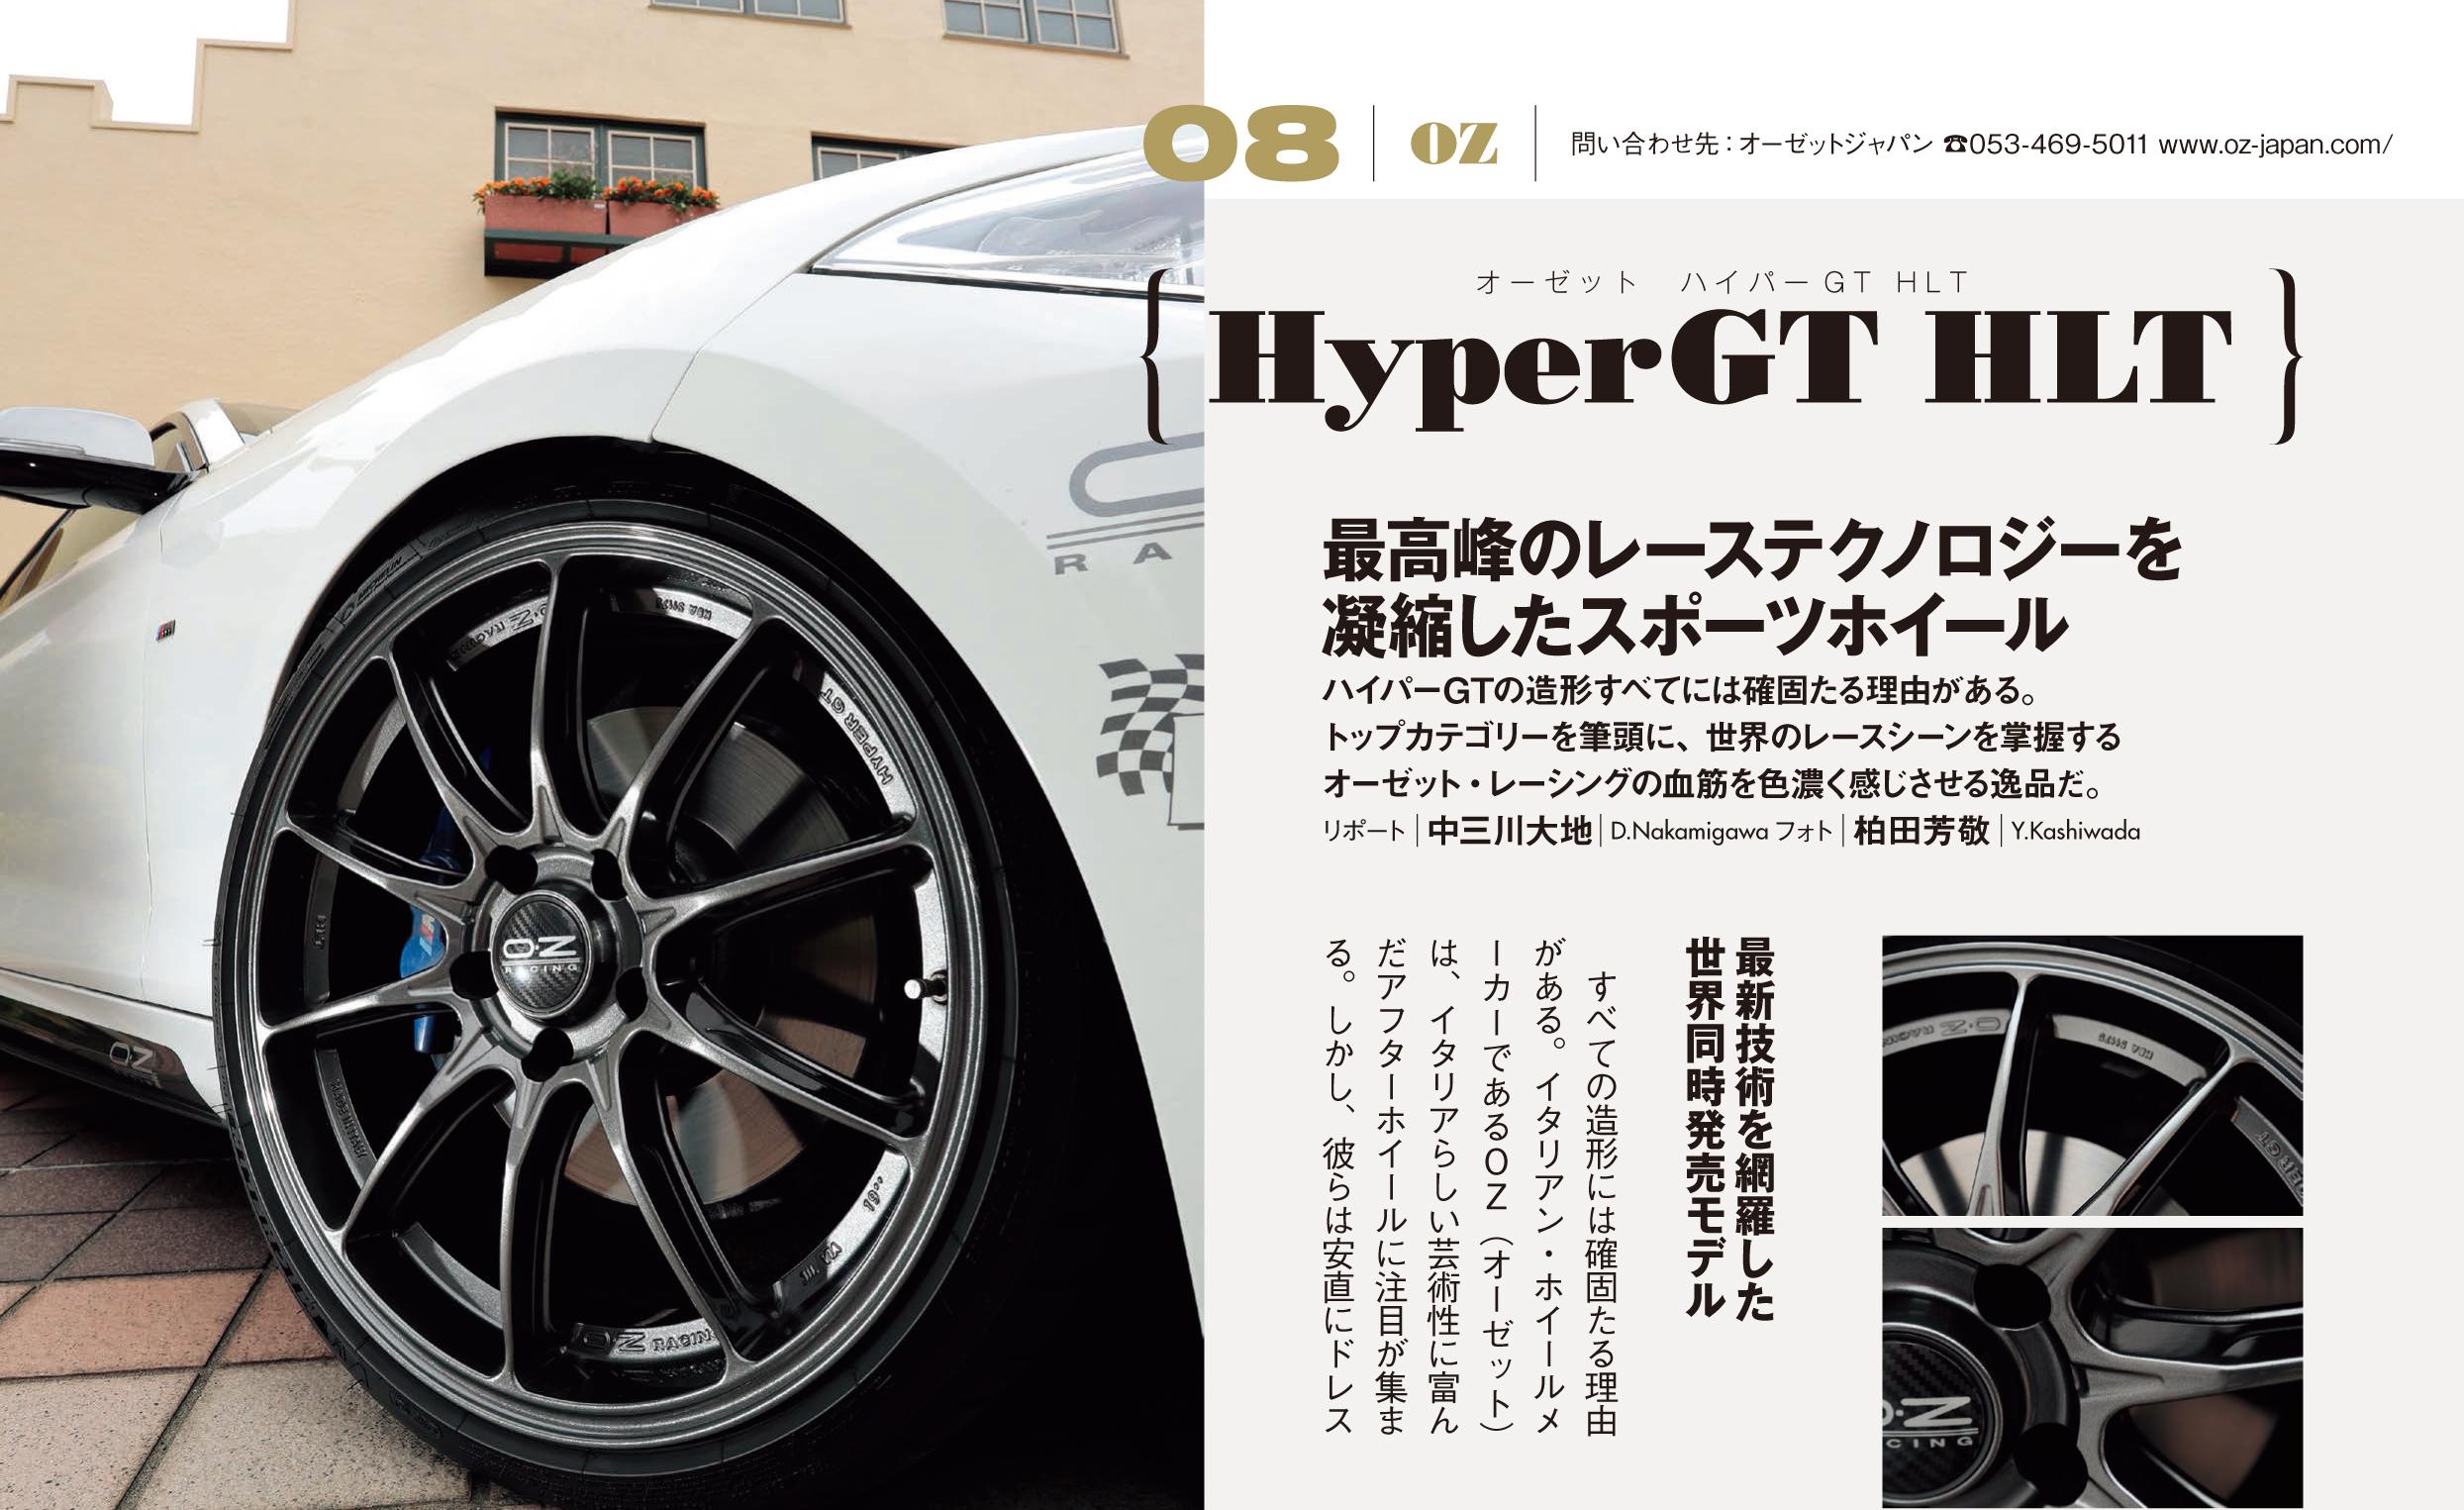 【商品情報】HyperGT HLT